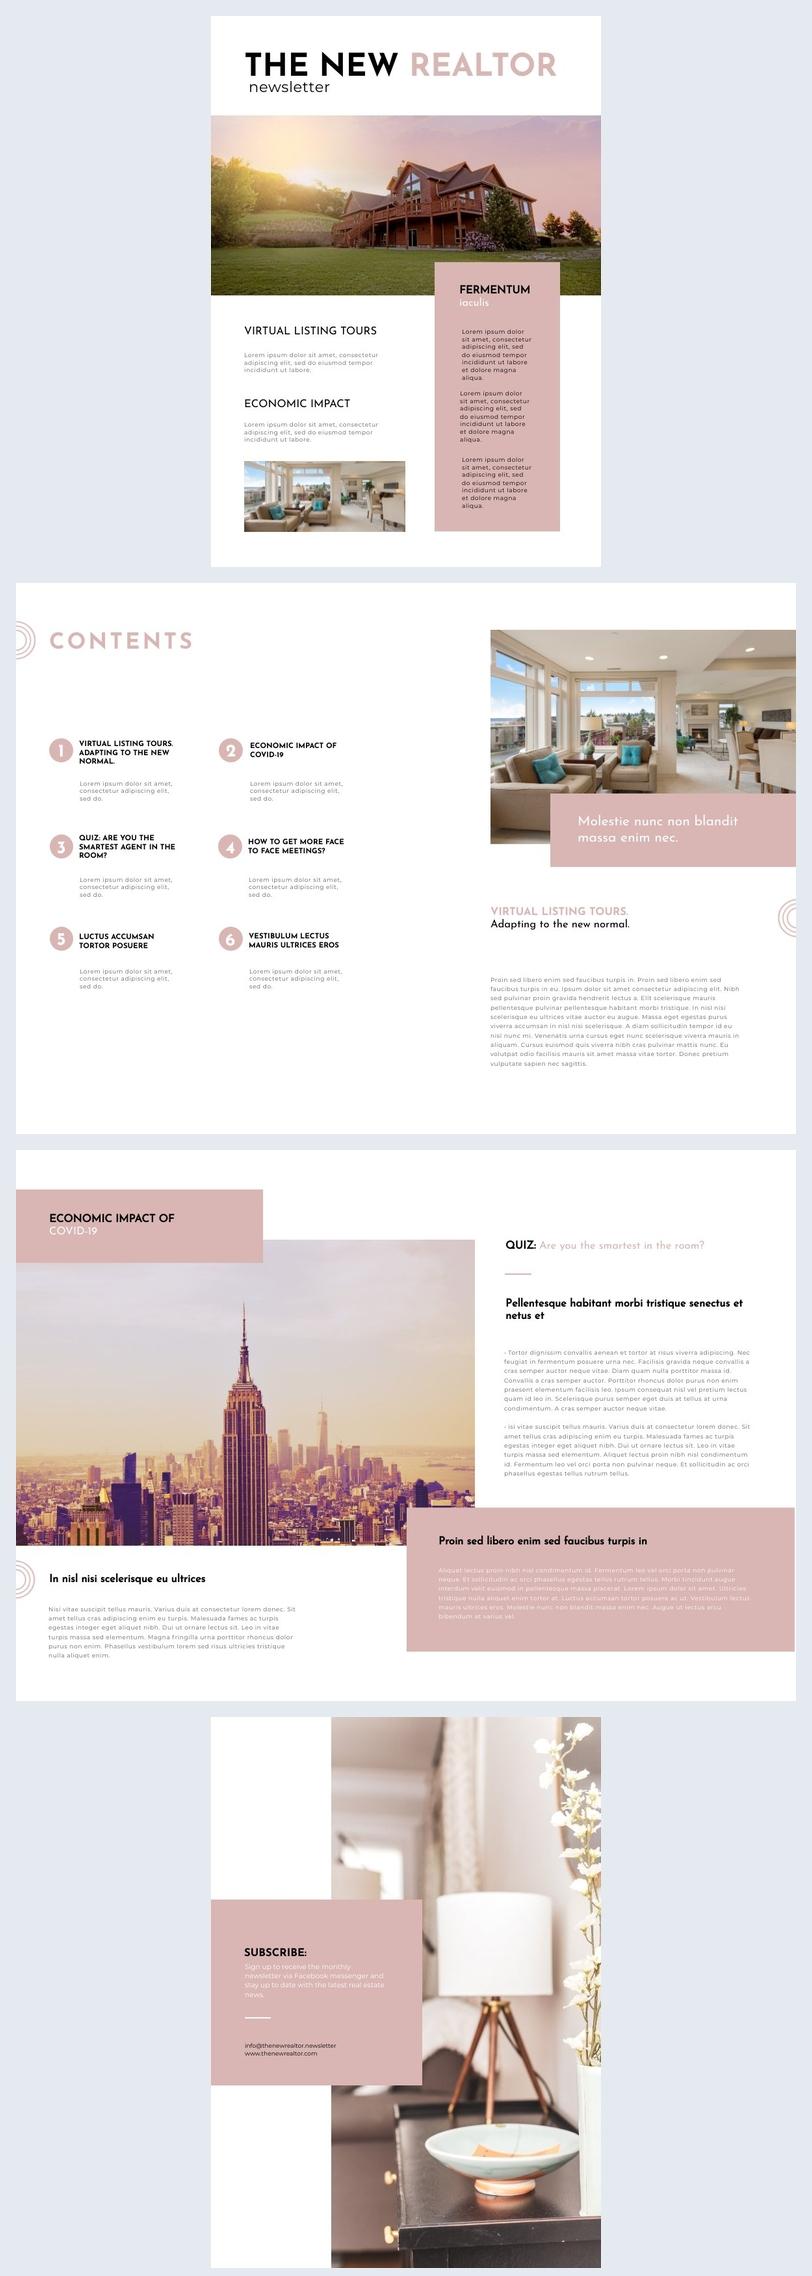 Realtor Monthly Newsletter Design Example